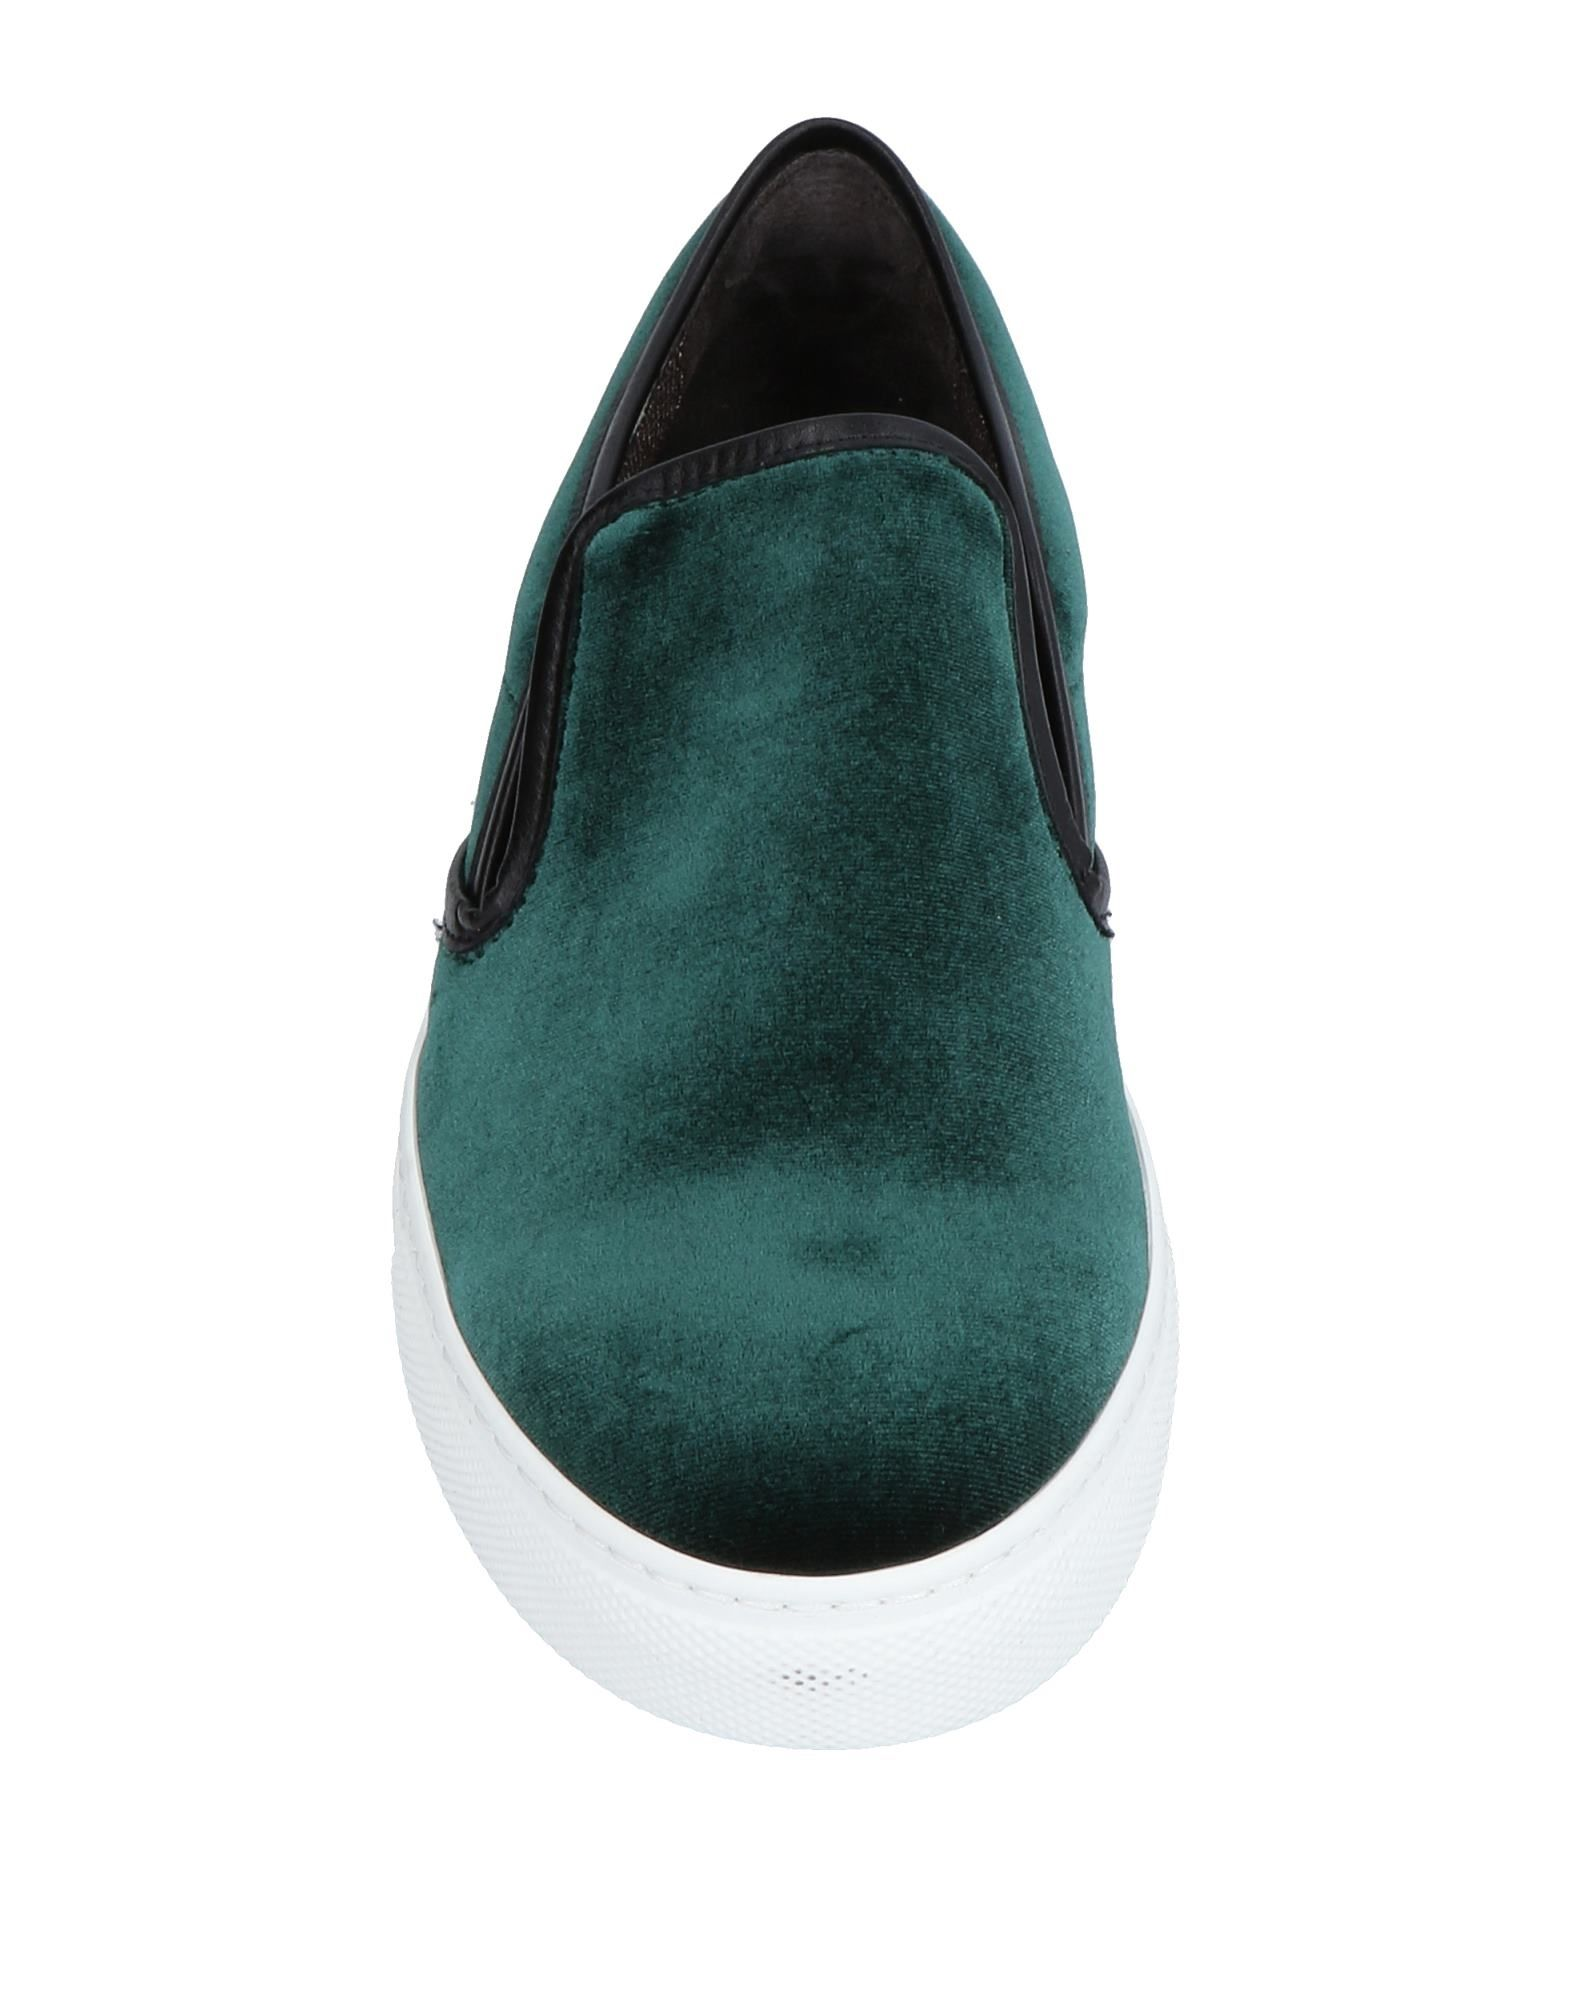 Rabatt echte ) Schuhe ( Verba ) echte Turnschuhes Herren 11484408BW 3bfce5